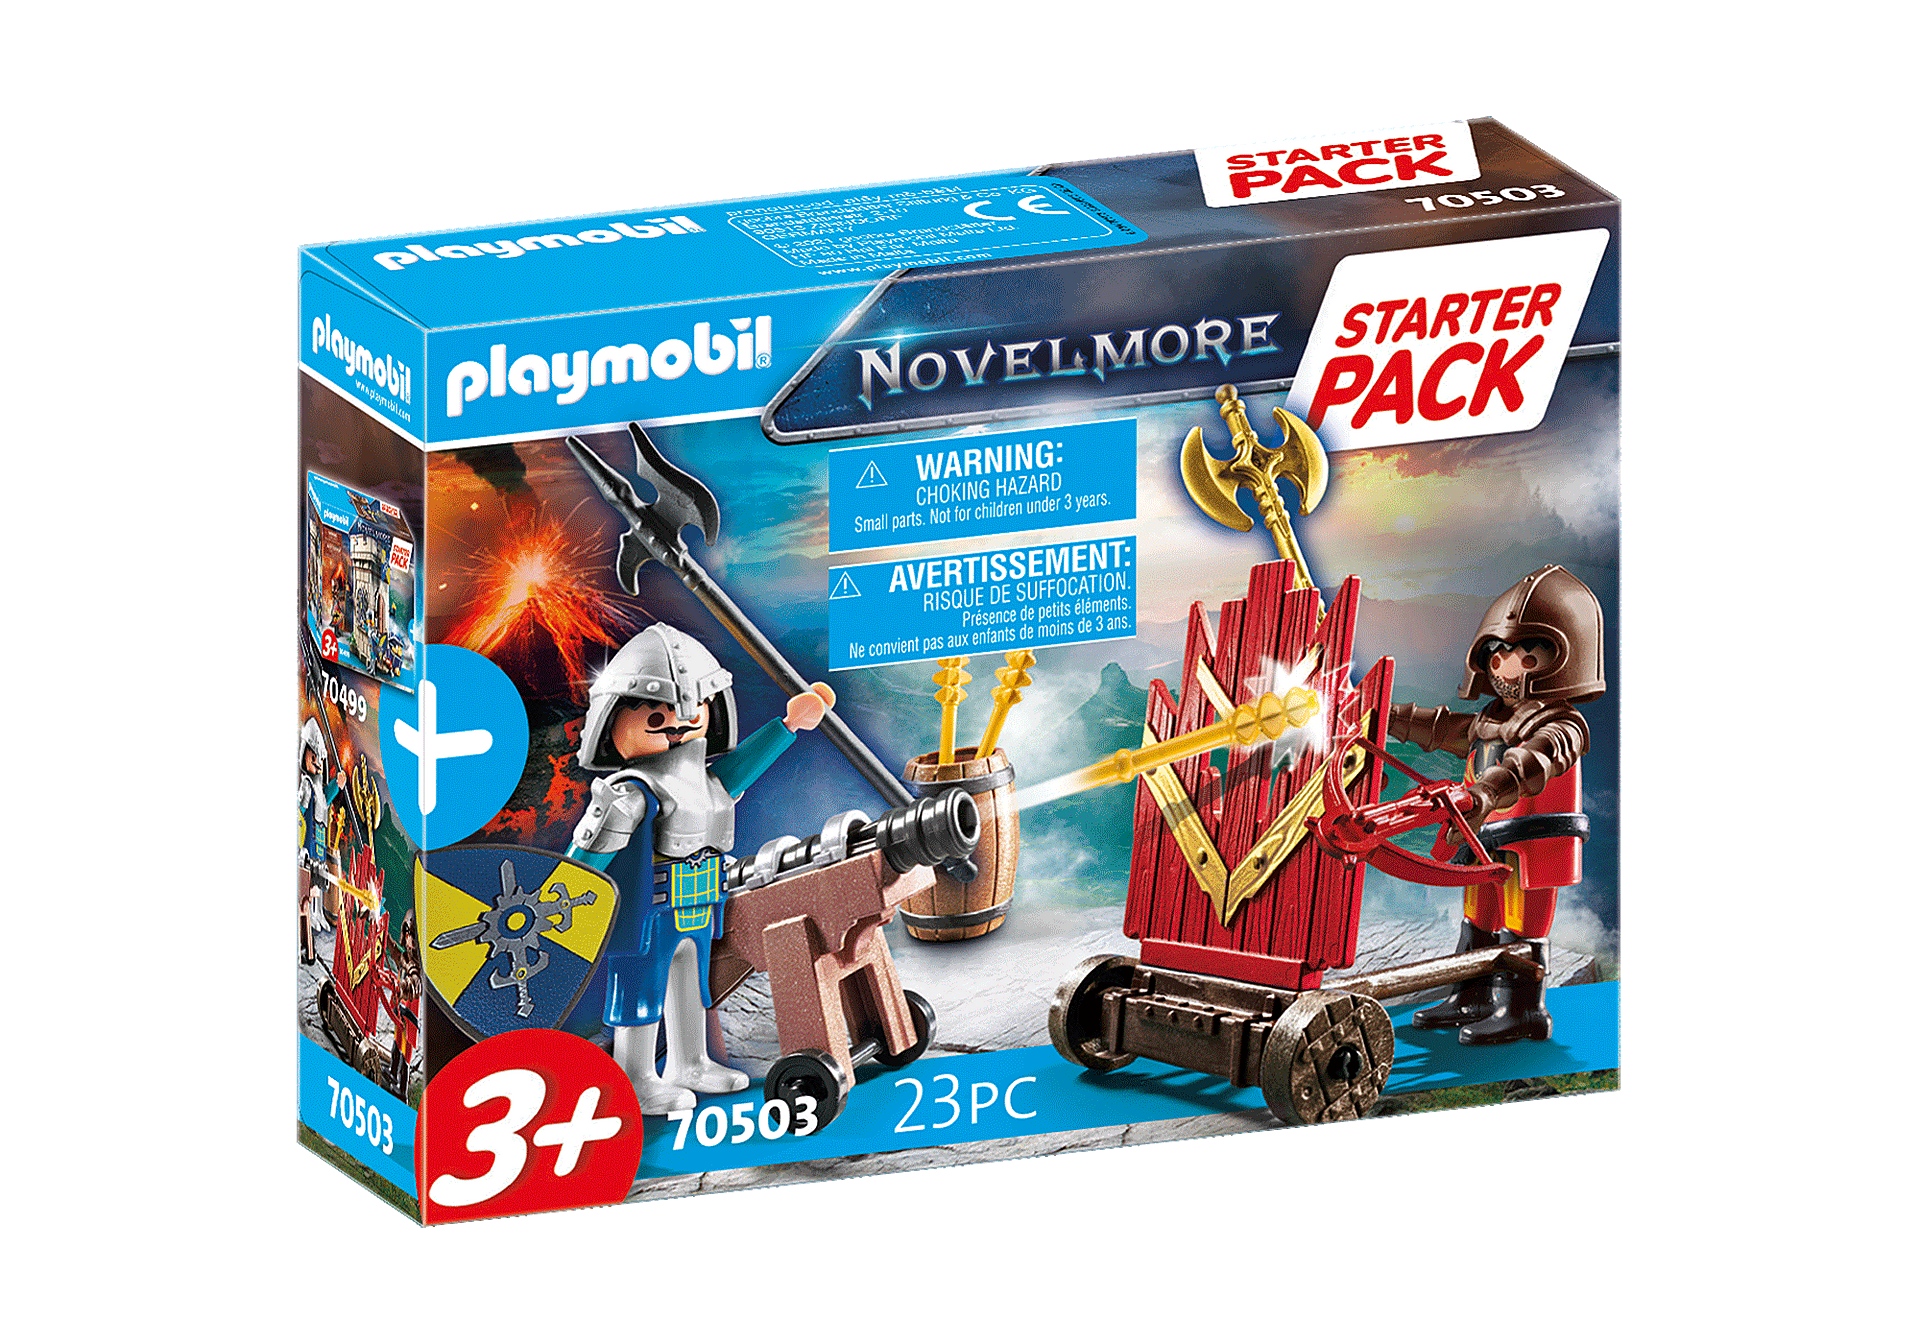 70503 Starter Pack Cavalieri di Novelmore zoom image2